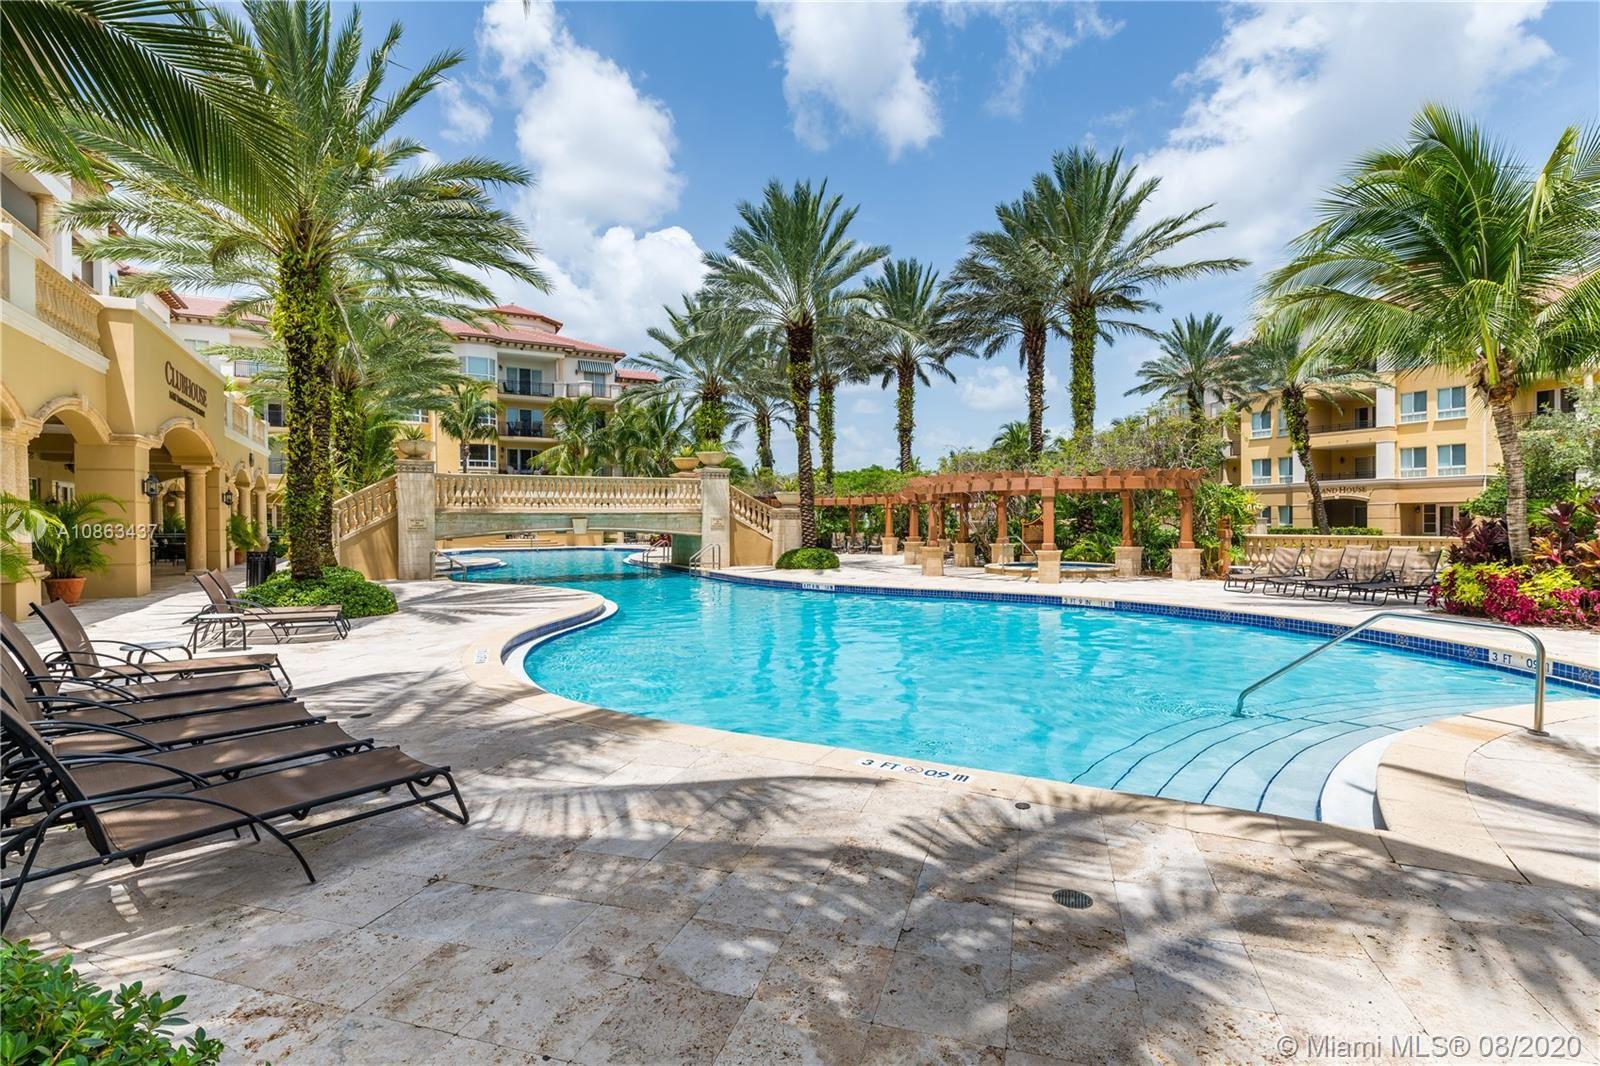 16102 Emerald Estates Dr #413, Weston, FL 33331 - #: A10863437